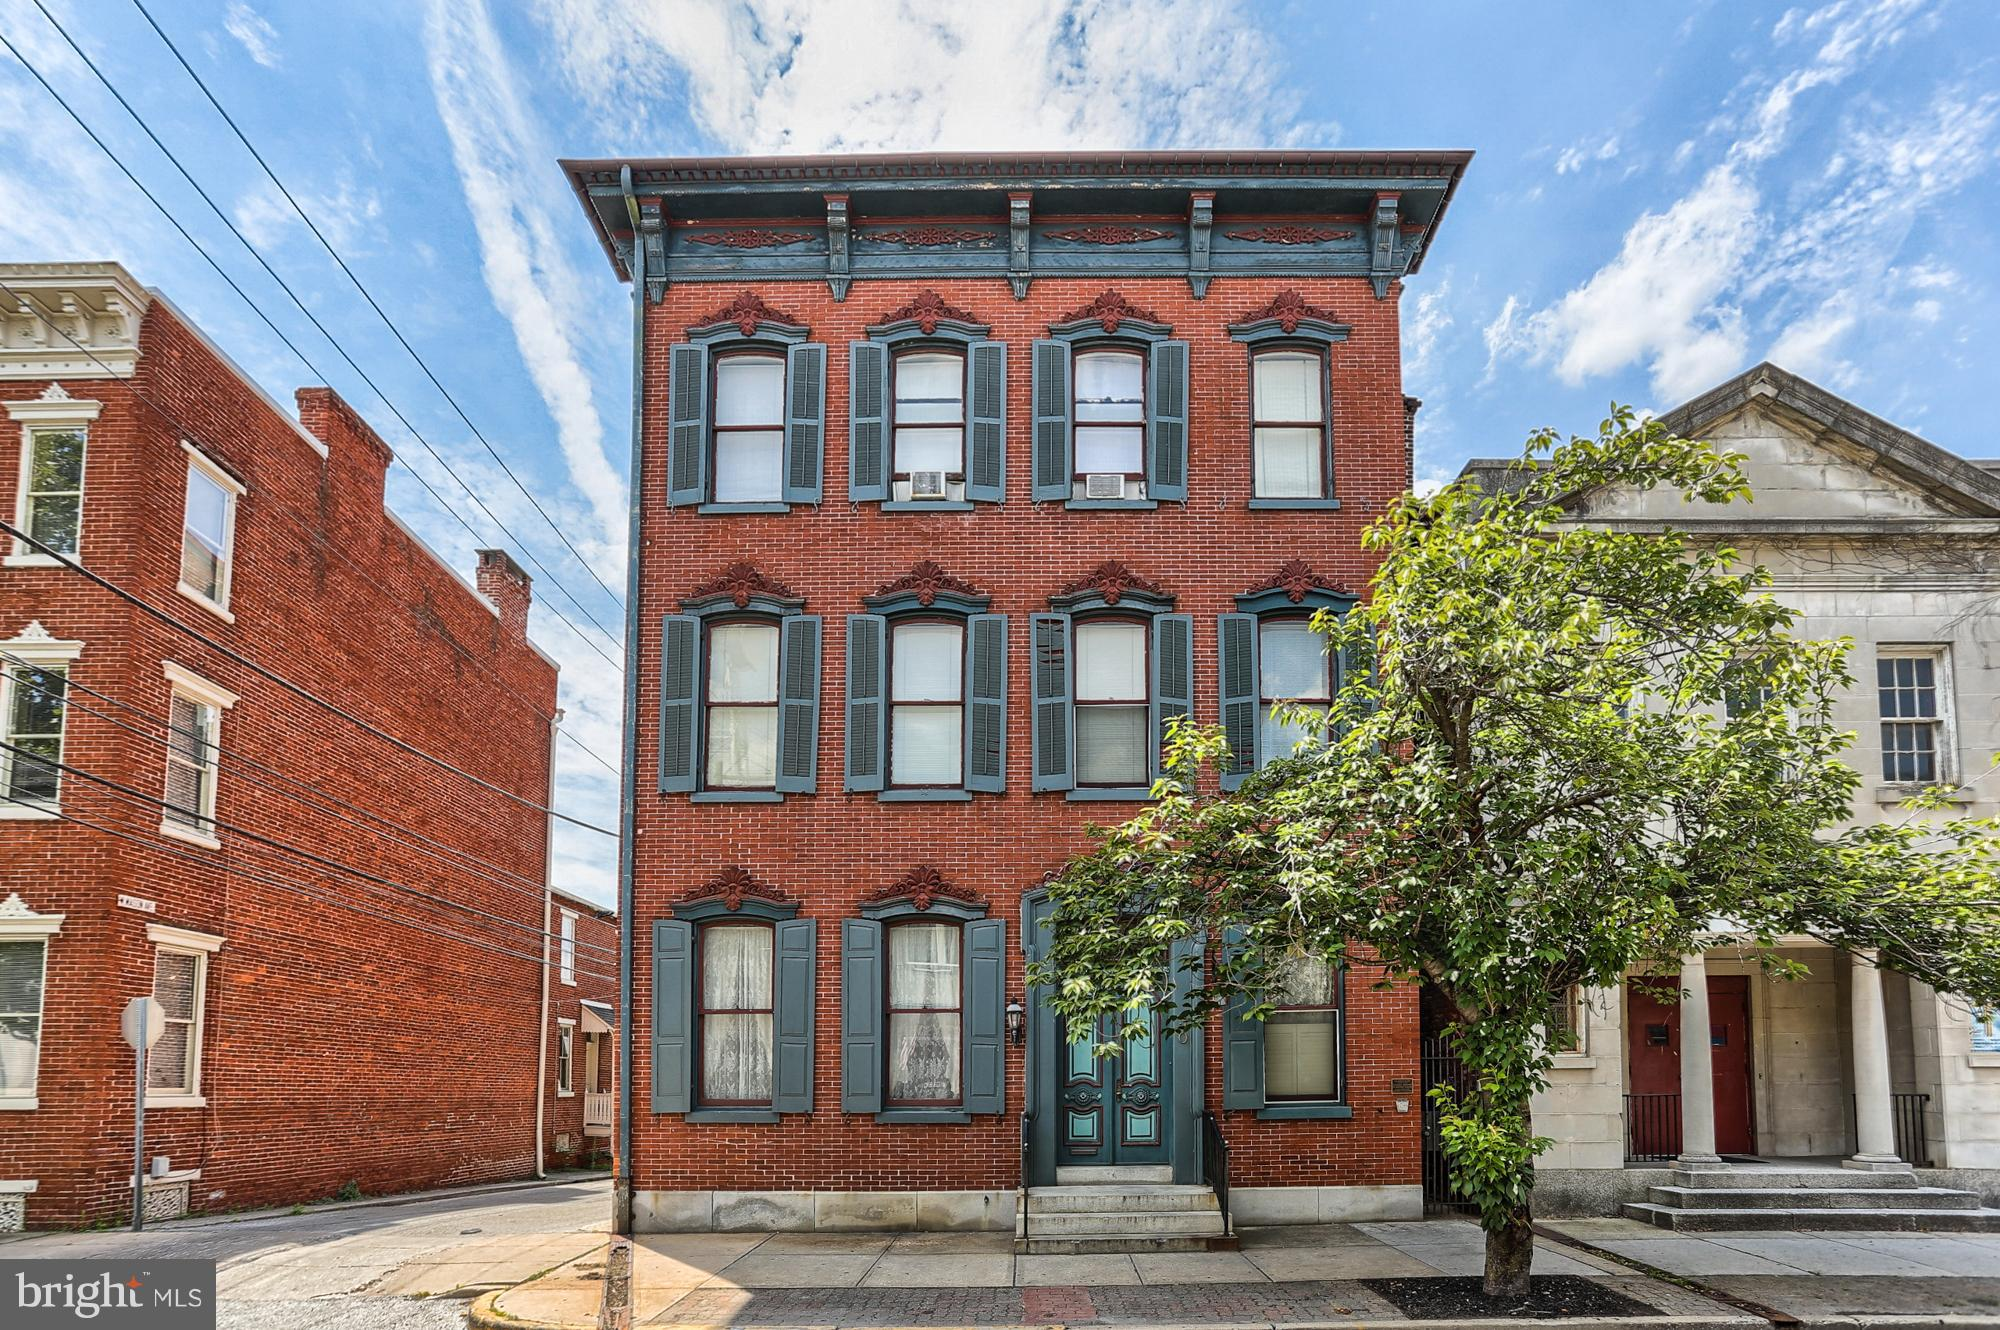 30 BEAVER STREET, YORK, PA 17401